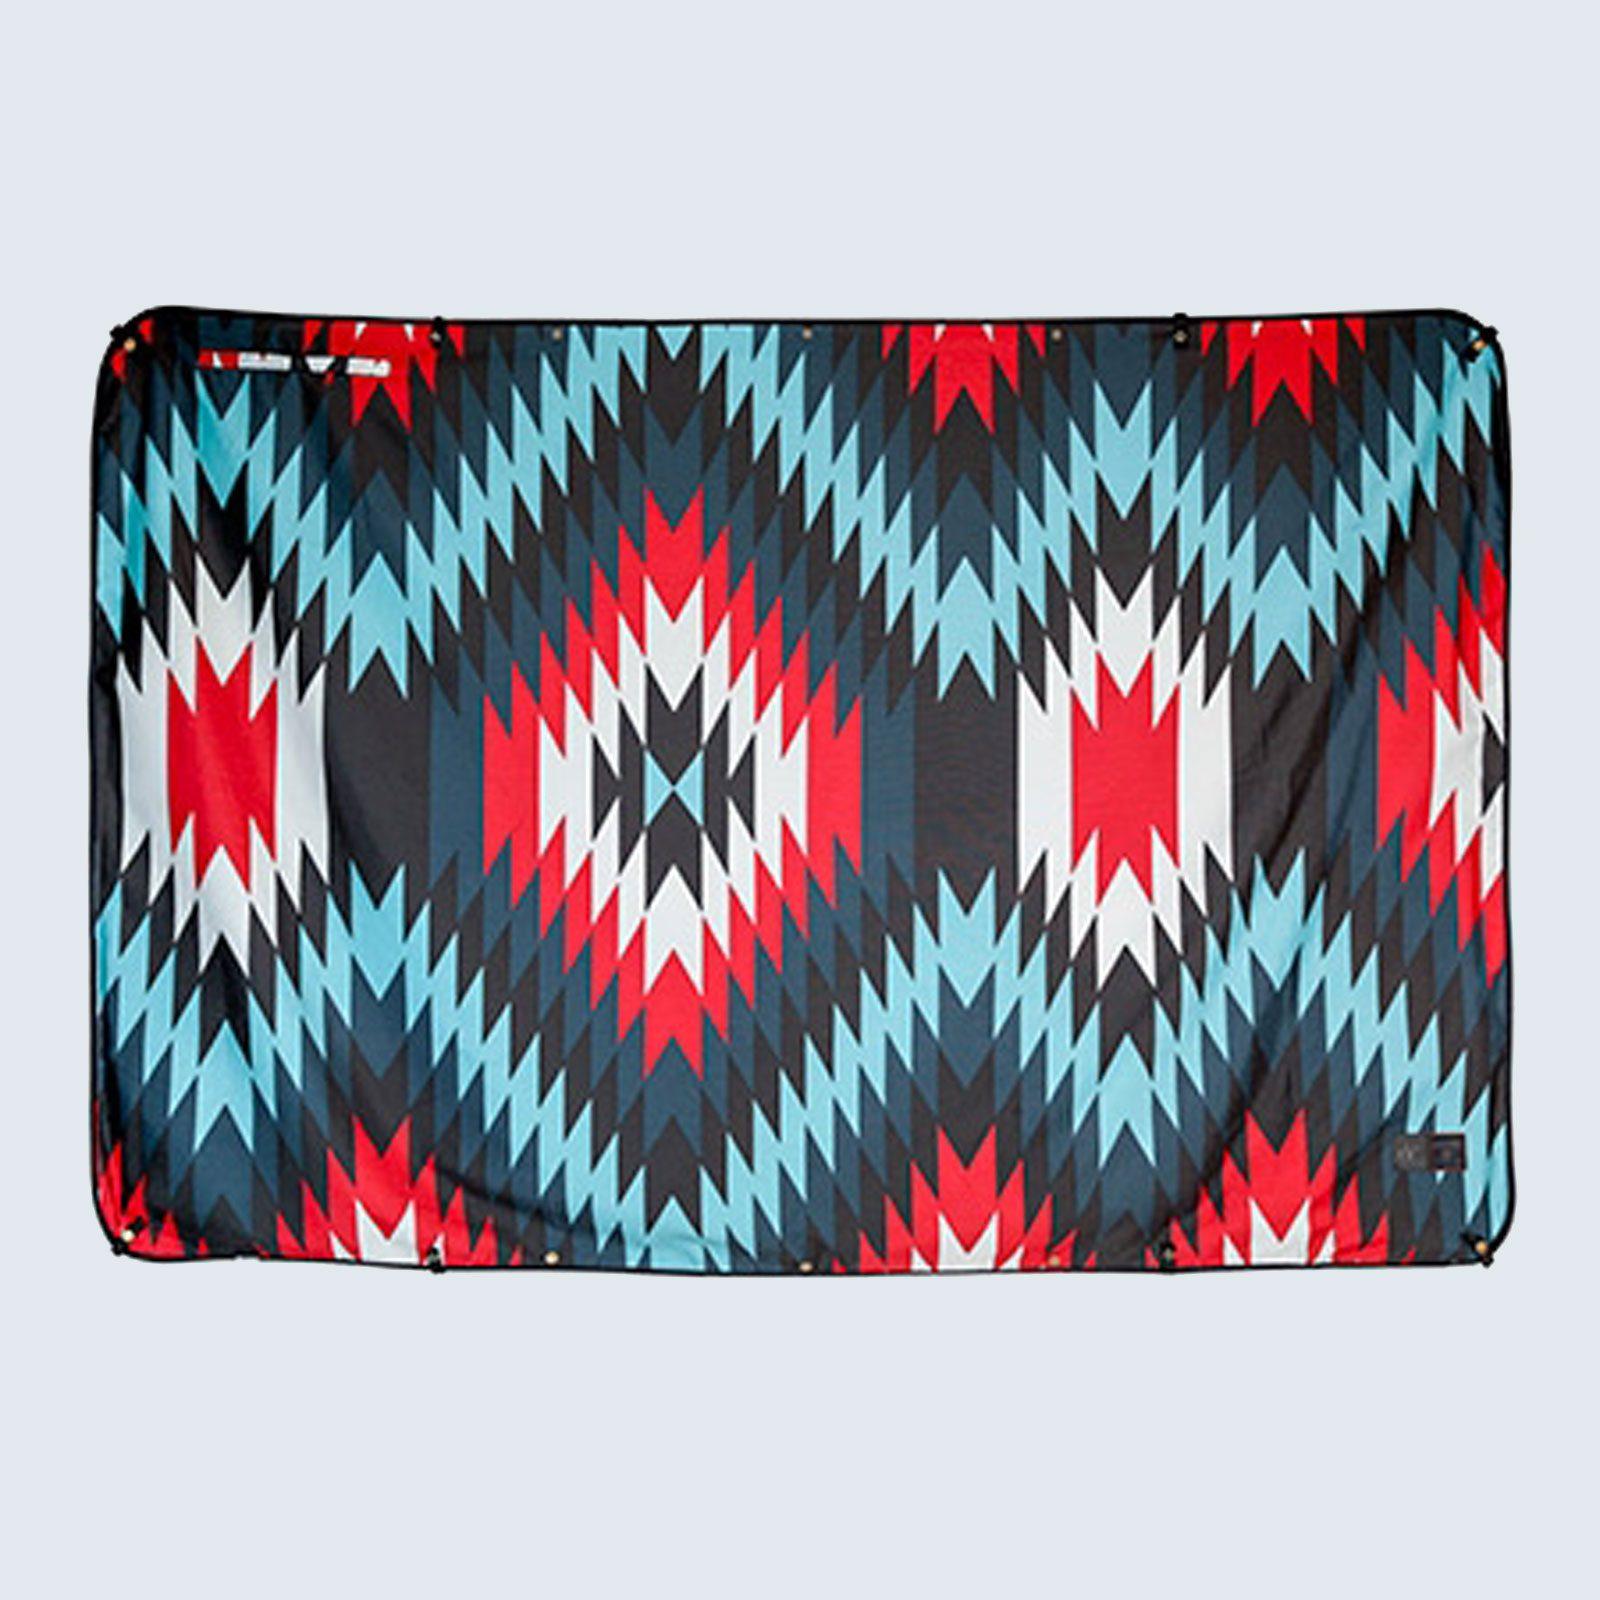 https://shop.highwest.com/general-store/high-west-x-coalatree-kachula-adventure-blanket.html